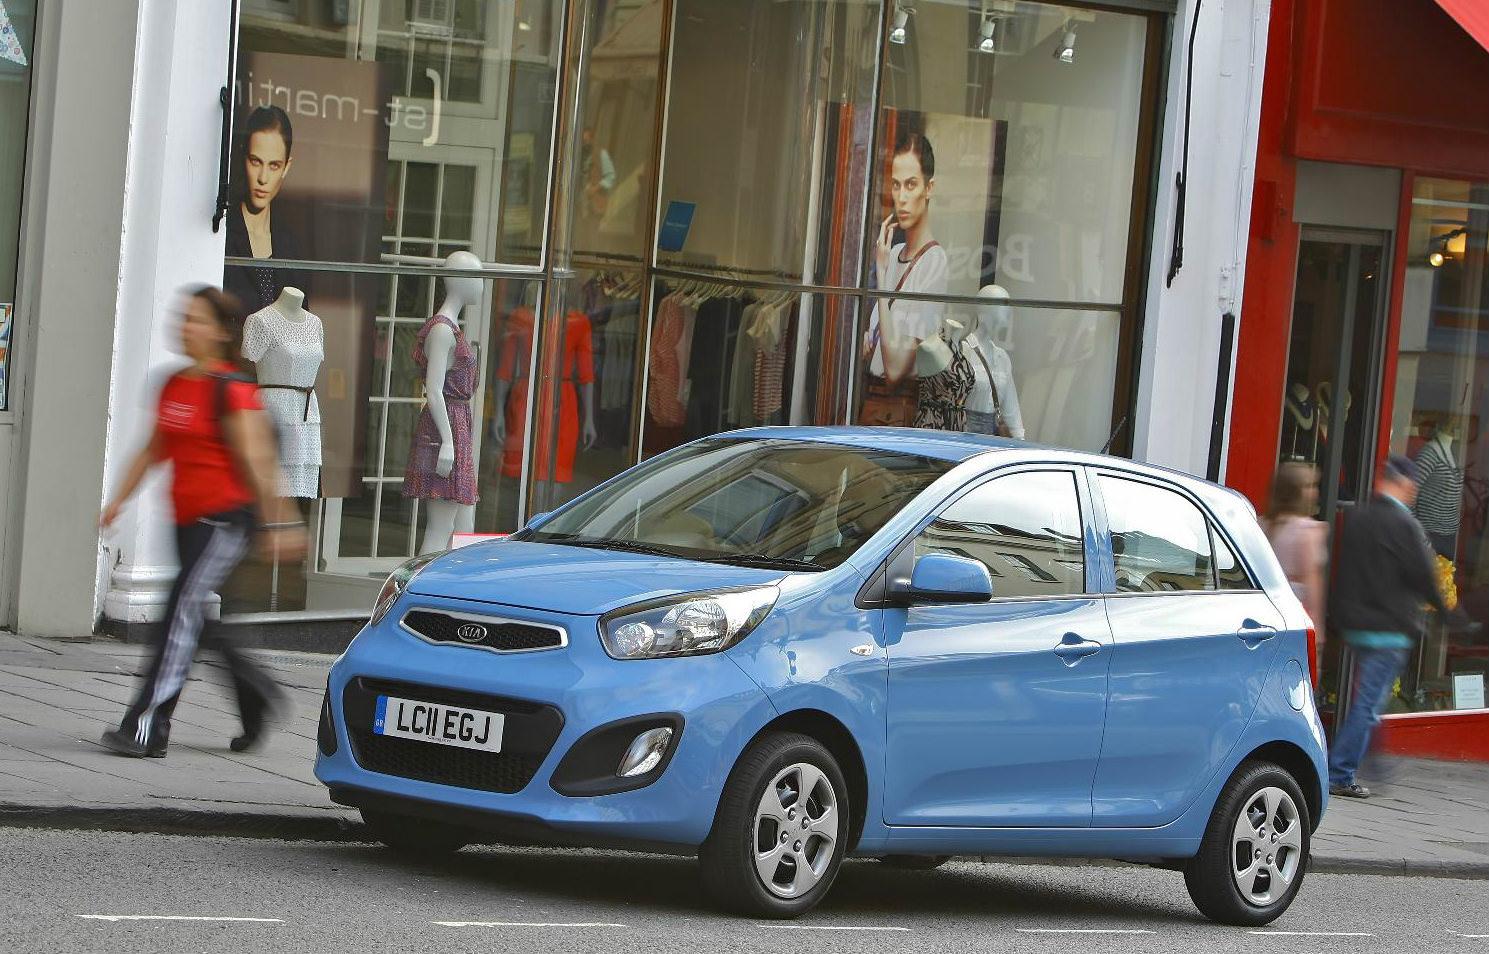 image of a blue kia picanto car exterior